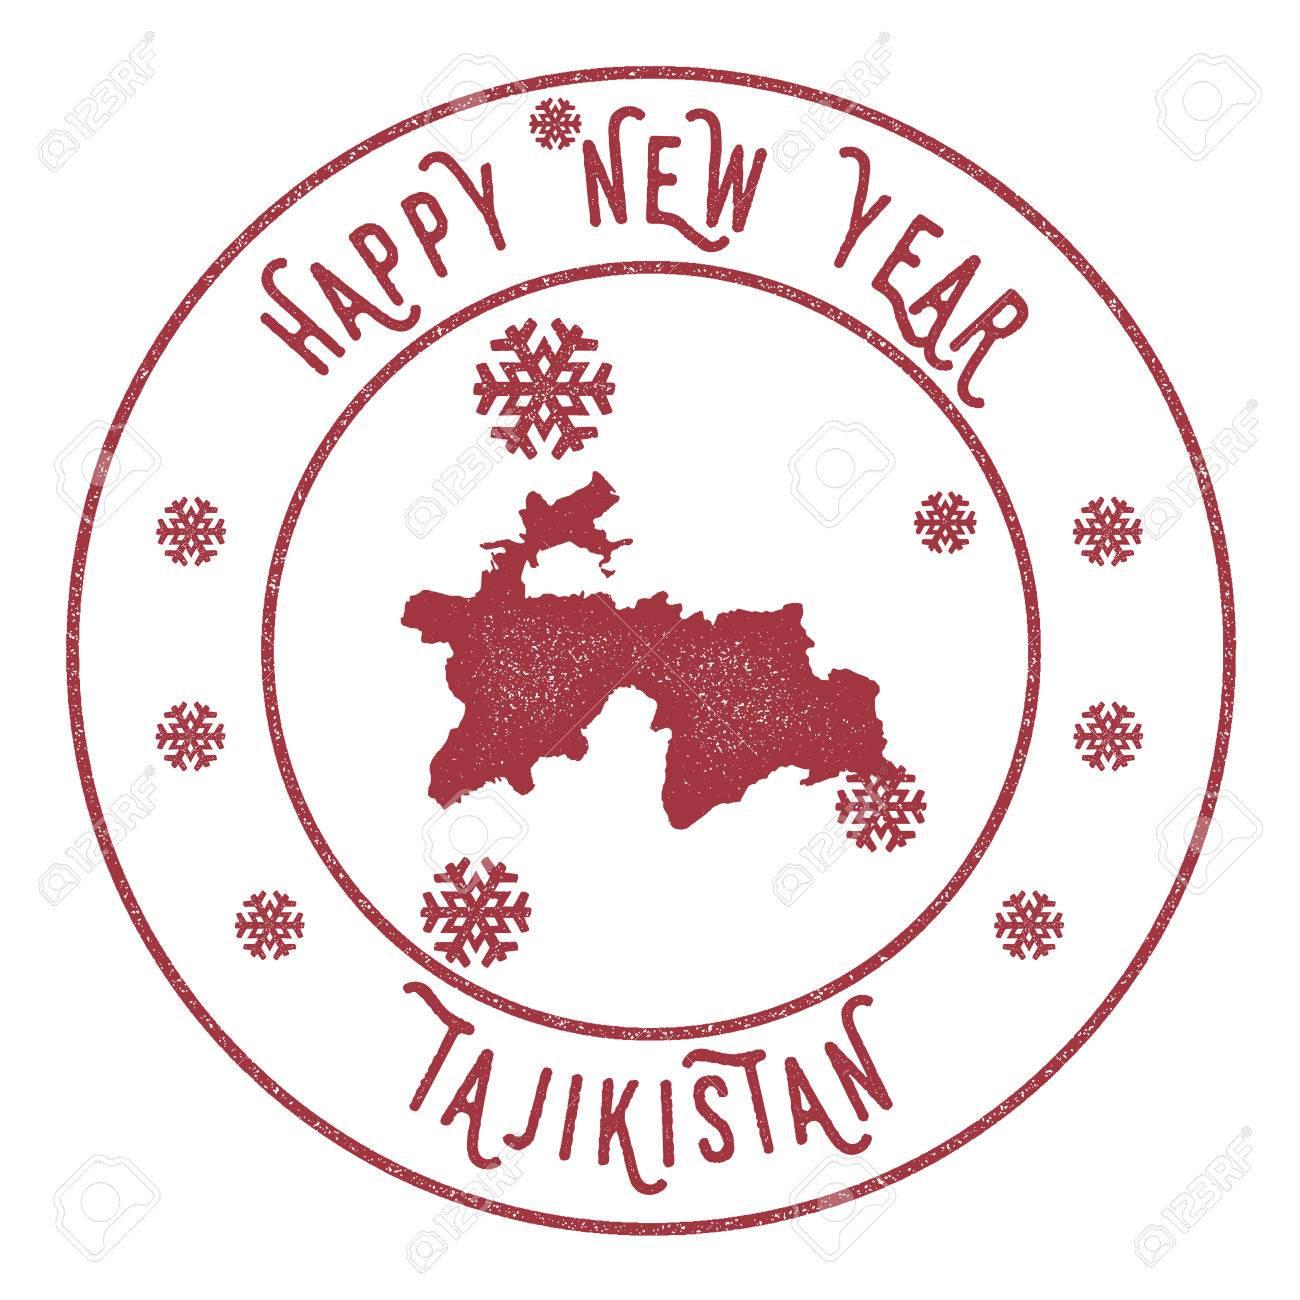 Retro Happy New Year Tajikistan Stamp Stylised Rubber Stamp - Tajikistan map vector